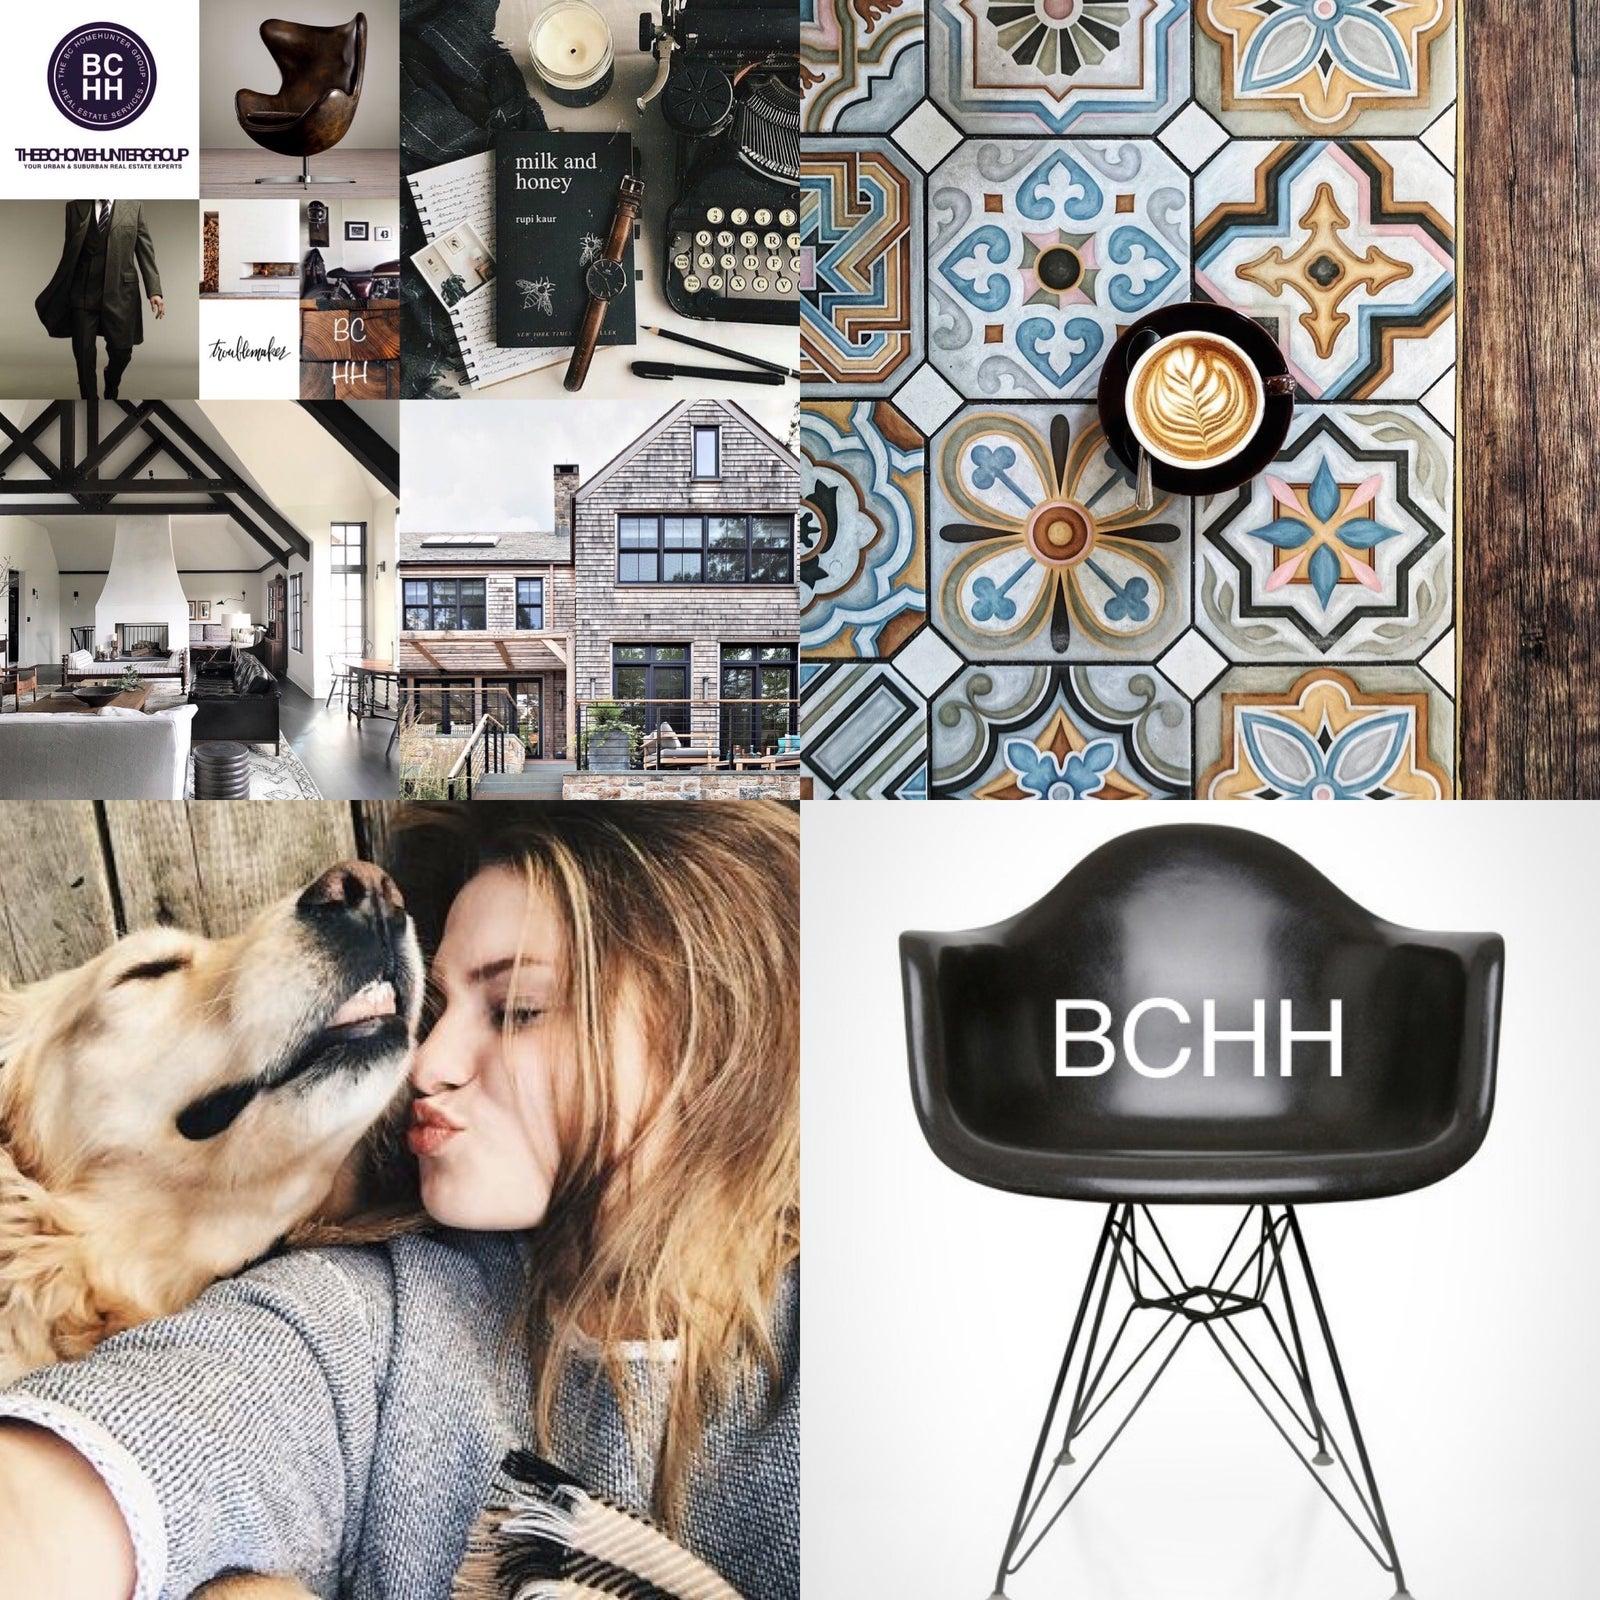 THE BC HOME HUNTER GROUP l AWARD WINNING URBAN & SUBURBAN REAL ESTATE SALES & HOMEOWNER ADVOCATES I METRO VANCOUVER l NORTH SHORE I SEA TO SKY I FRASER VALLEY l VANCOUVER ISLAND I OKANAGAN I WEST COAST I BC 604-767-6736 #BCHOMEHUNTER.COM #BCHH #WESELLBC.COM #WELOVEBC.COM #WEAREBCREALESTATE.COM #BCHH.CA VANCOUVERHOMEHUNTER.COM NORTHSHOREHOMEHUNTER.COM FRASERVALLEYHOMEHUNTER.COM #Vancouver #NorthShore #WestVancouver #NorthVancouver #FraserValley #CoalHarbour #Kerrisdale #Kitsilano #PointGrey #Marpole #Dunbar #Oakridge #Coquitlam #EastVan #NorthShoreHomehunter #Yaletown #FraserValleyHomeHunter #VancouverHomeHunter #LynnValley #Lonsdale #WhiteRock #VancouverHomeHunter #FraserValleyHomeHunter #NorthShoreHomeHunter #WhiteRockHomeHunter #SouthSurreyHomeHunter Vancouver Real Estate North Shore Real Estate Fraser Valley Real Estate #VANRE  @BCHOMEHUNTER  THE BC HOME HUNTER GROUP  AWARD WINNING URBAN & SUBURBAN REAL ESTATE TEAM WITH HEART 604-767-6736  METRO VANCOUVER I FRASER VALLEY I BC  #Vancouver #WhiteRock #SouthSurrey #Starbucks #WestVancouver #Langley #MapleRidge #NorthVancouver #Langley #FraserValley #Burnaby #FortLangley #PittMeadows #Delta #Richmond #CoalHarbour #Surrey #Abbotsford #FraserValley #Kerrisdale #Cloverdale #Coquitlam #EastVan #Richmond #PortMoody #Yaletown #CrescentBeach #BCHHREALTY #MorganCreek #PortMoody #Burnaby #WeLoveBC #OceanPark #FraserValleyHomeHunter #VancouverHomeHunter#surreyhomehunter #southsurreyhomehunter #morganheightshomehunter #abbotsfordhomehunter #squamishhomehunter #whistlerhomehunter #portcoquitlamhomehunter #yaletownhomehunter #eastvancouverhomehunter #chilliwackhomehunter #okanaganhomehunter #islandhomehunter #canadianhomehunter #canadahomehunter #fixeruppercanada #fixeruppervancouver #604life #welovebc #wesellbc #urbansuburbanhomehunter #urbanhomehunter #suburbanhomehunter #sunshinecoasthomehunter #townhomehunter #condohomehunter #waterfronthomehunter #resorthomehunter #fraservalleysold #whiterocksold #langleysold #northvansold #